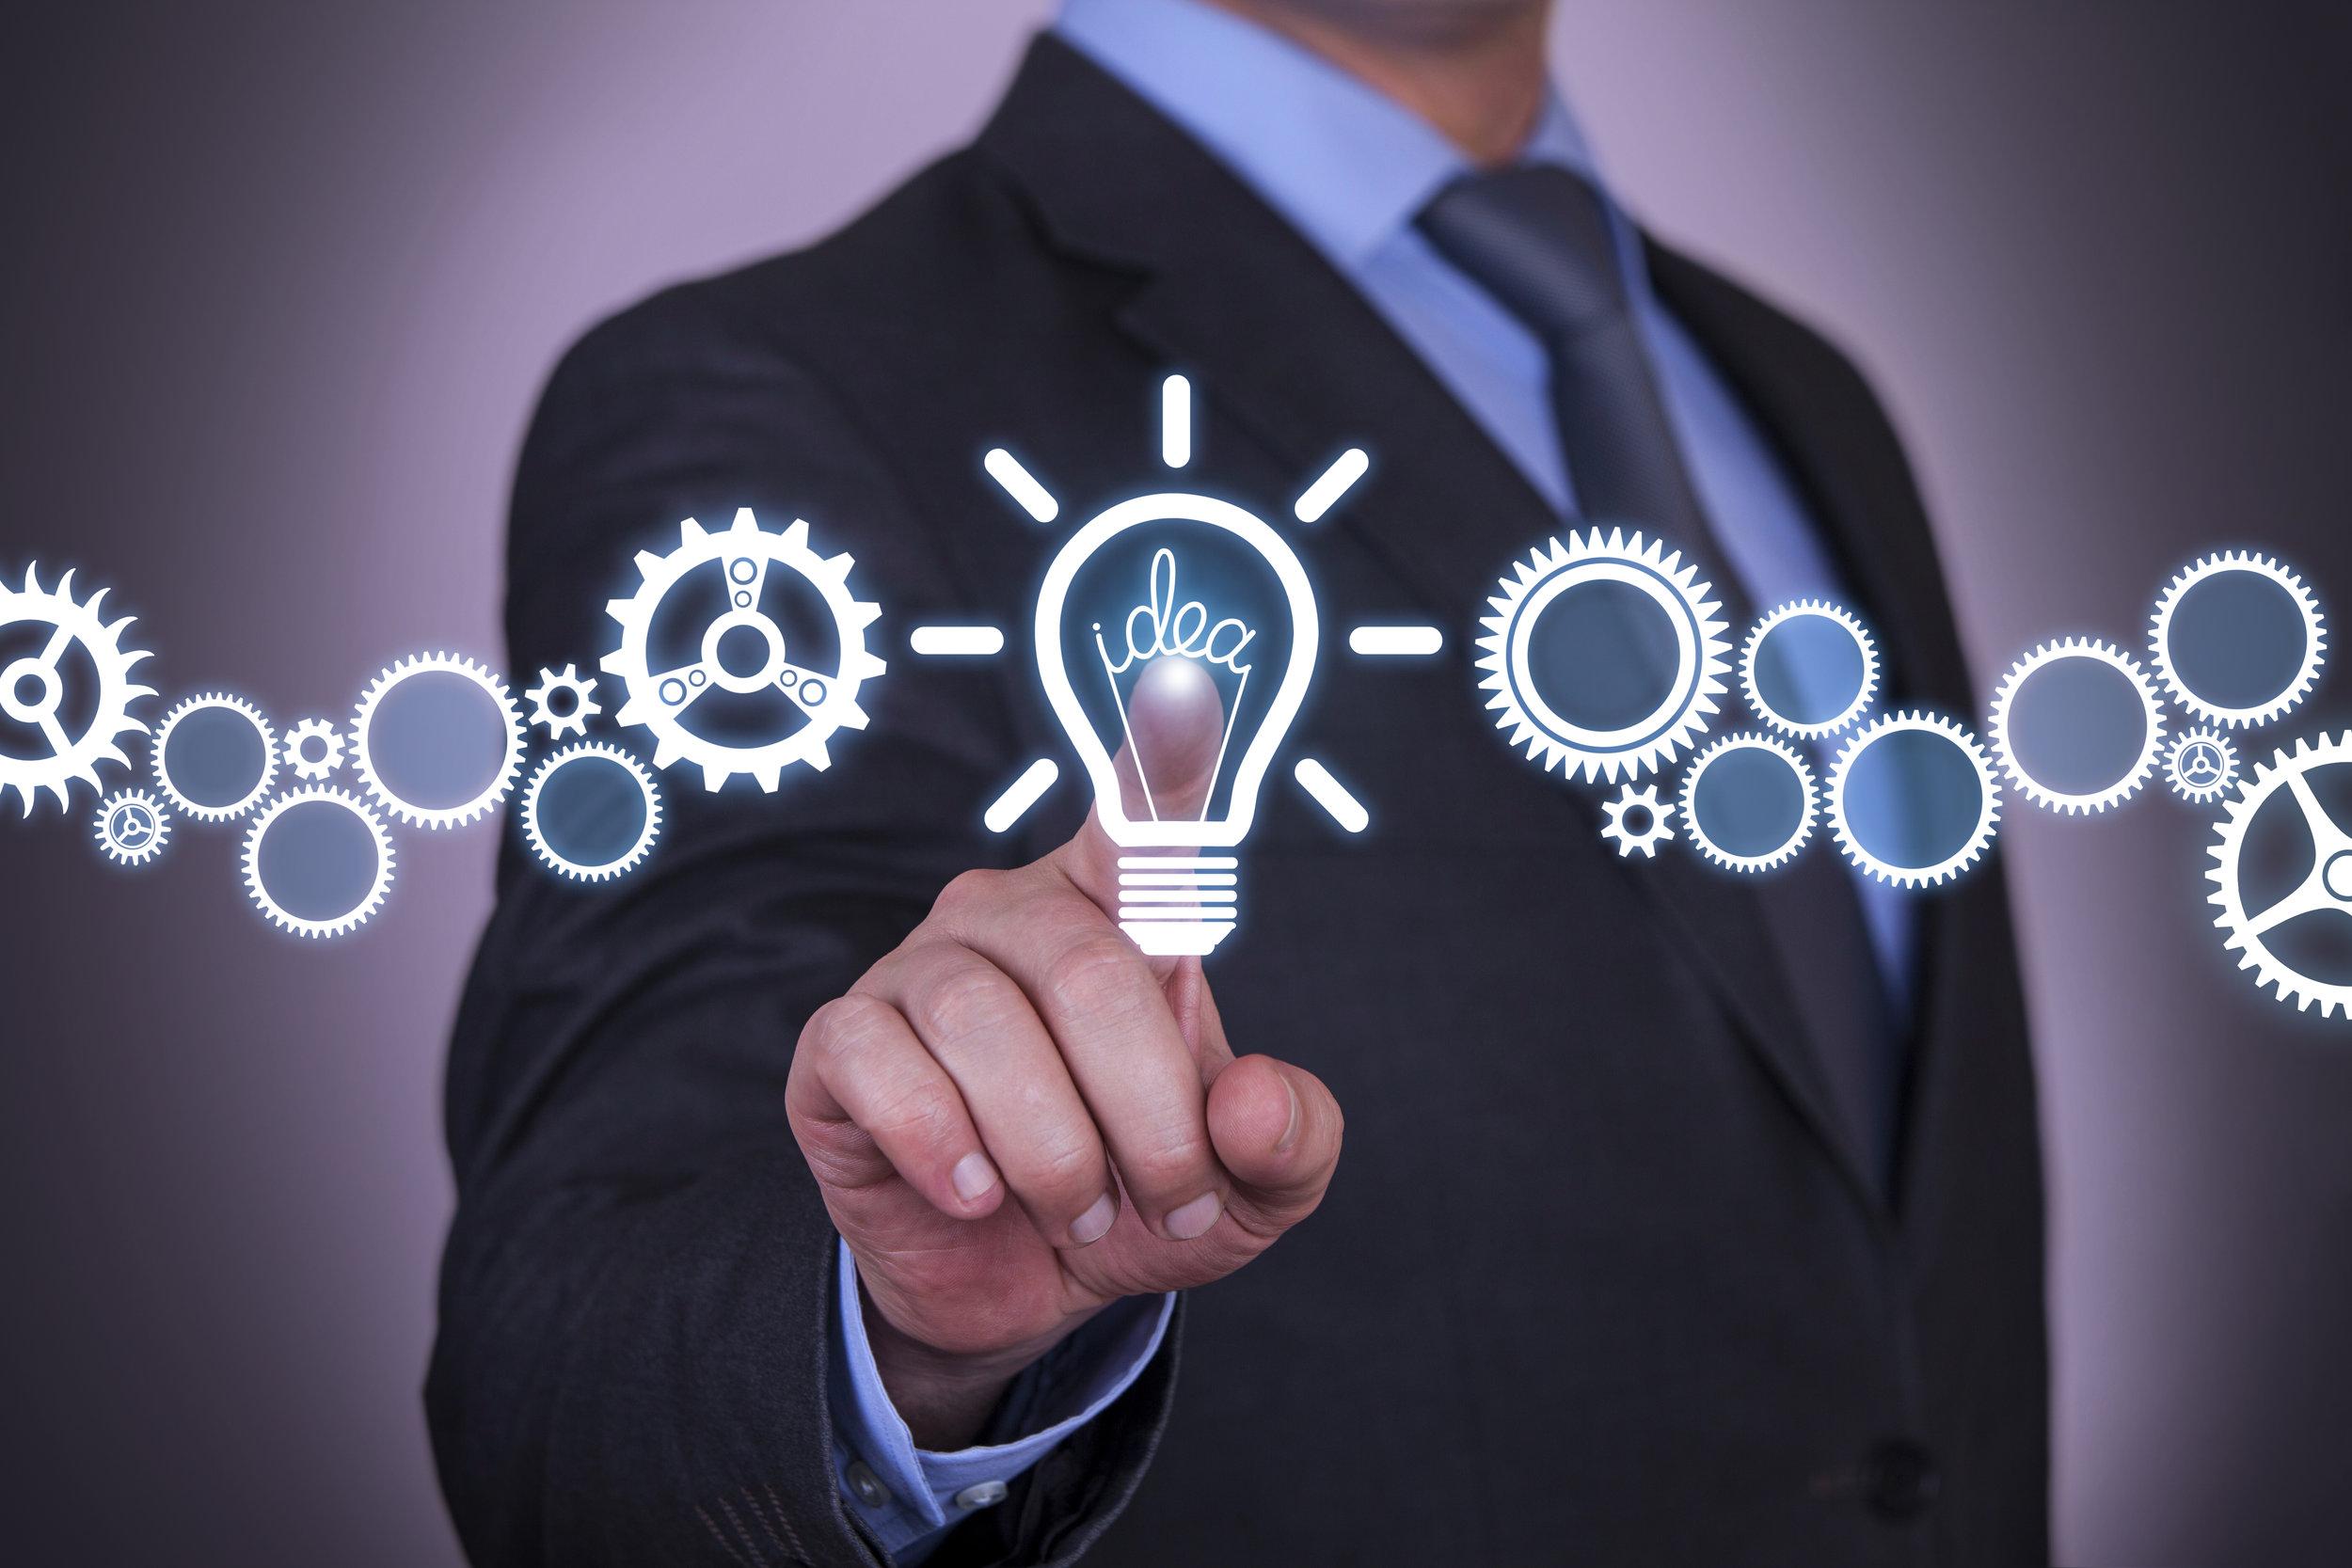 bigstock-Businessman-Touching-Idea-Conc-89682140.jpg